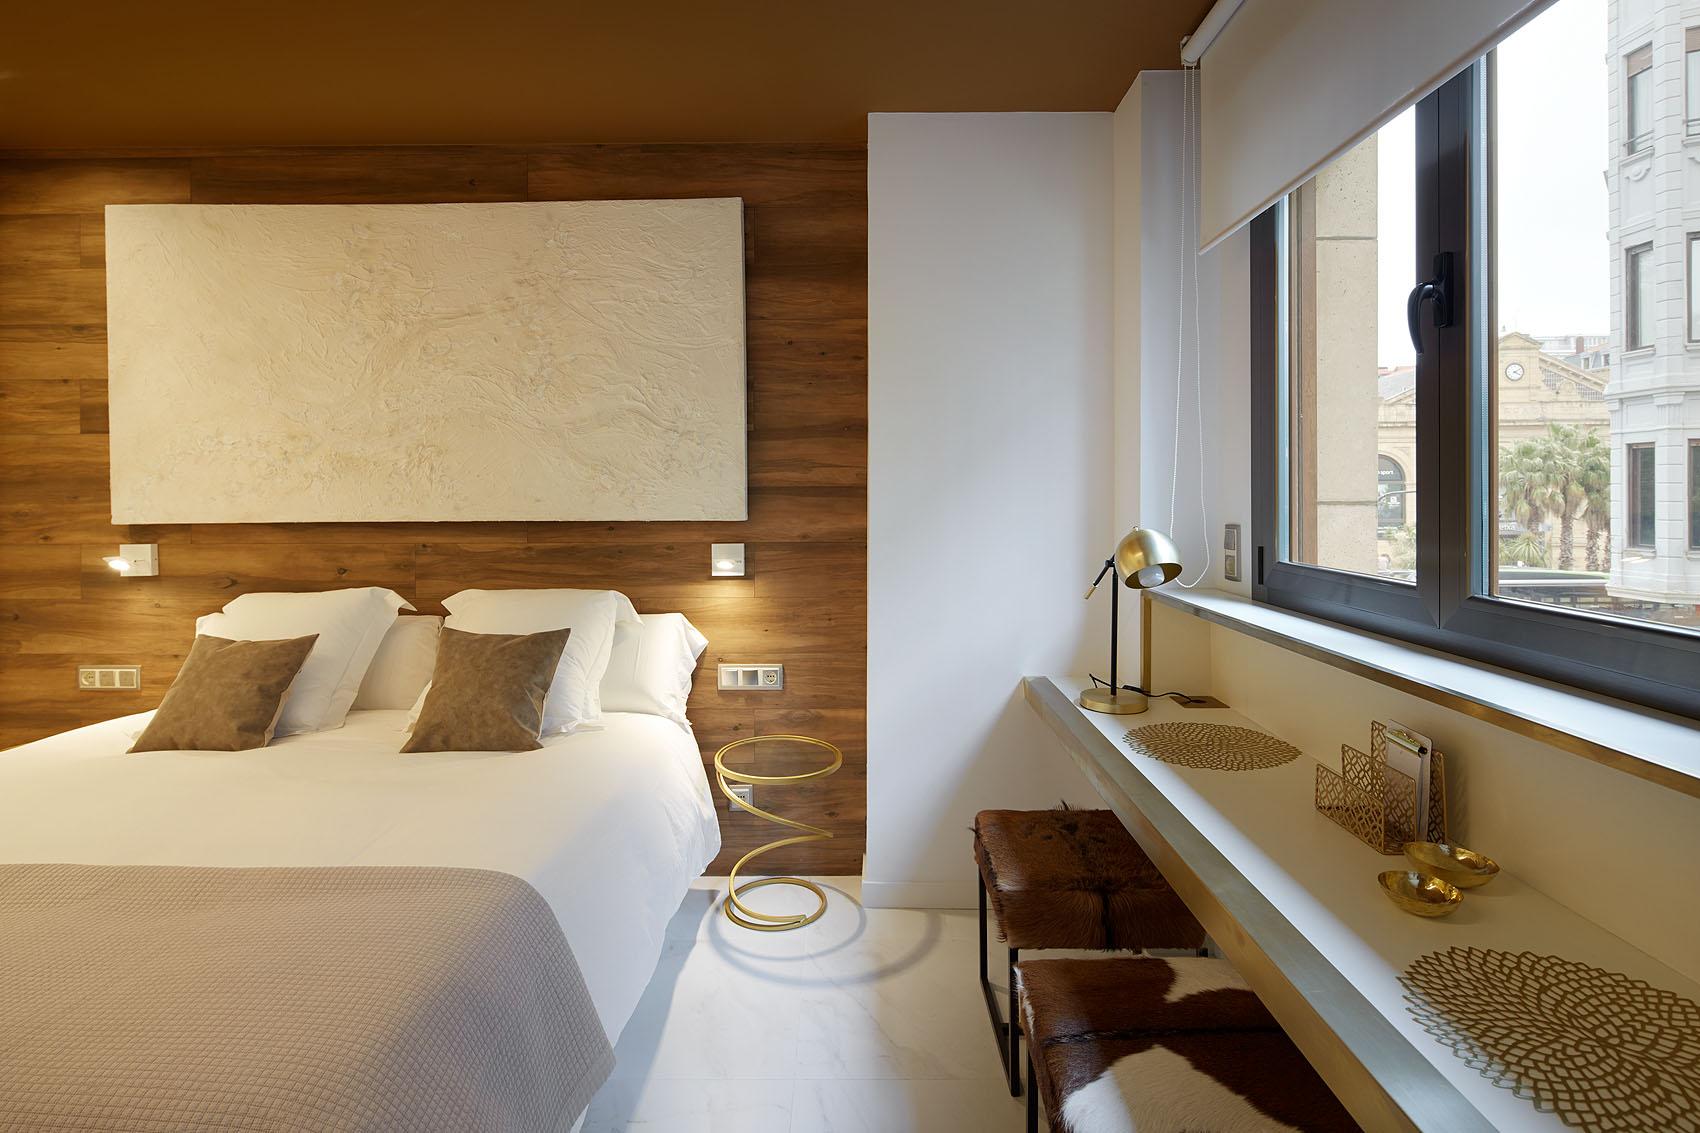 Apartamento Boulevard Suite - Iñaki Caperochipi - Fotografía